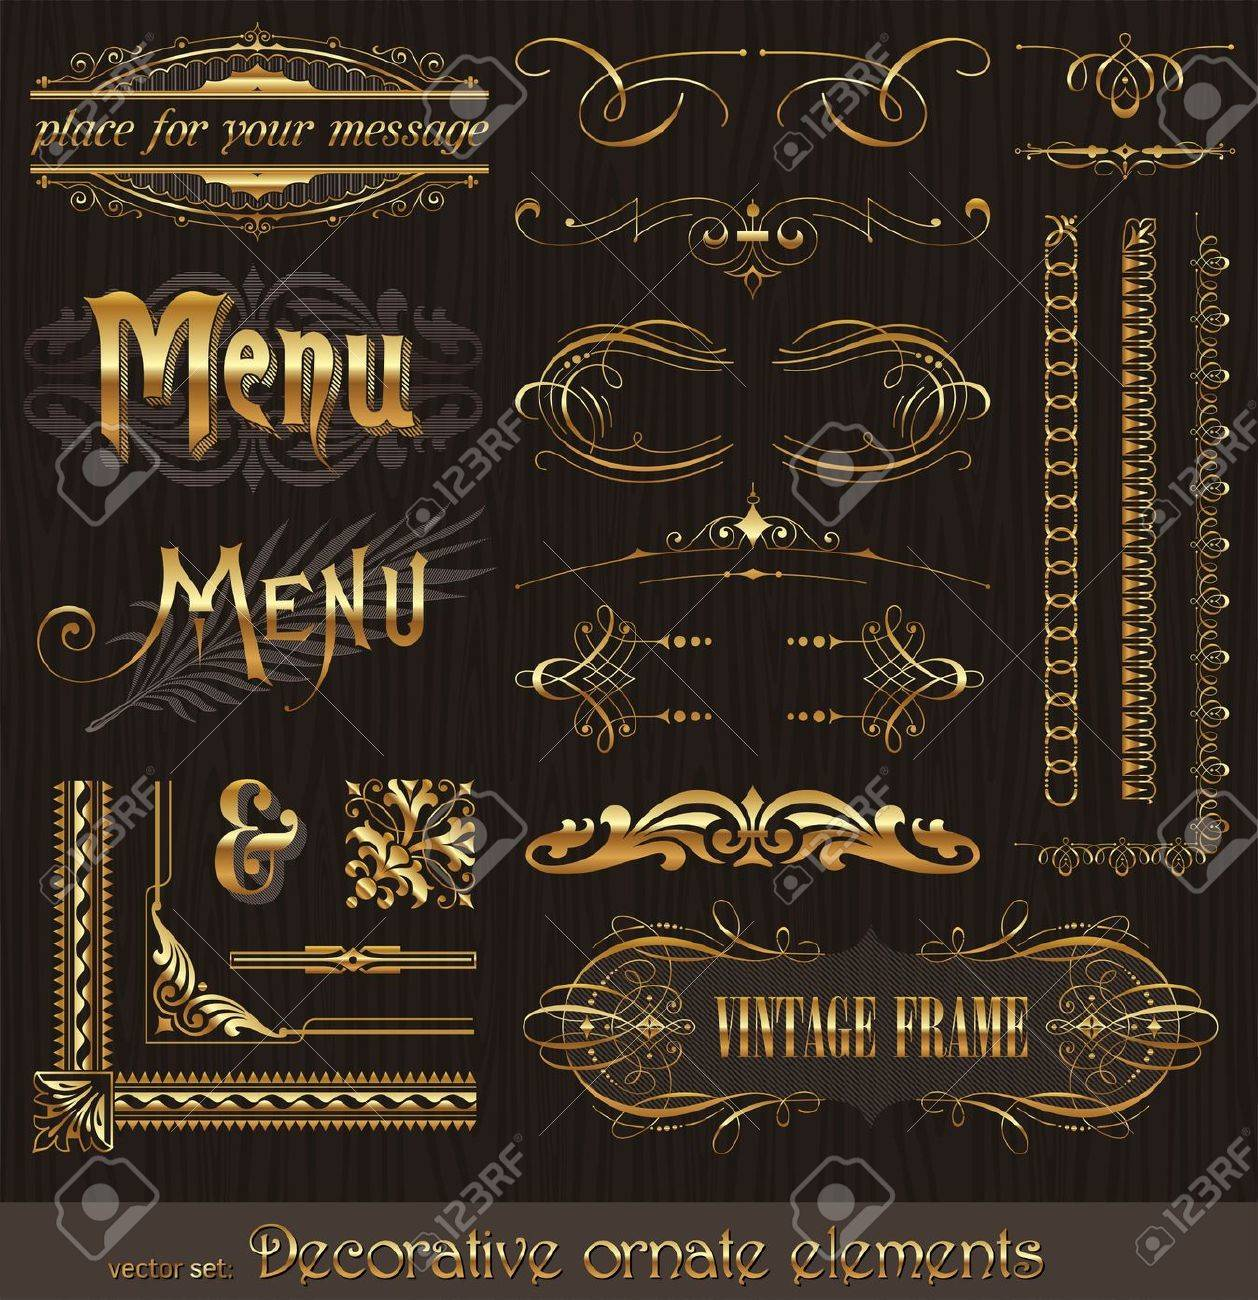 Ornate golden design elements & page decor Stock Vector - 9953413